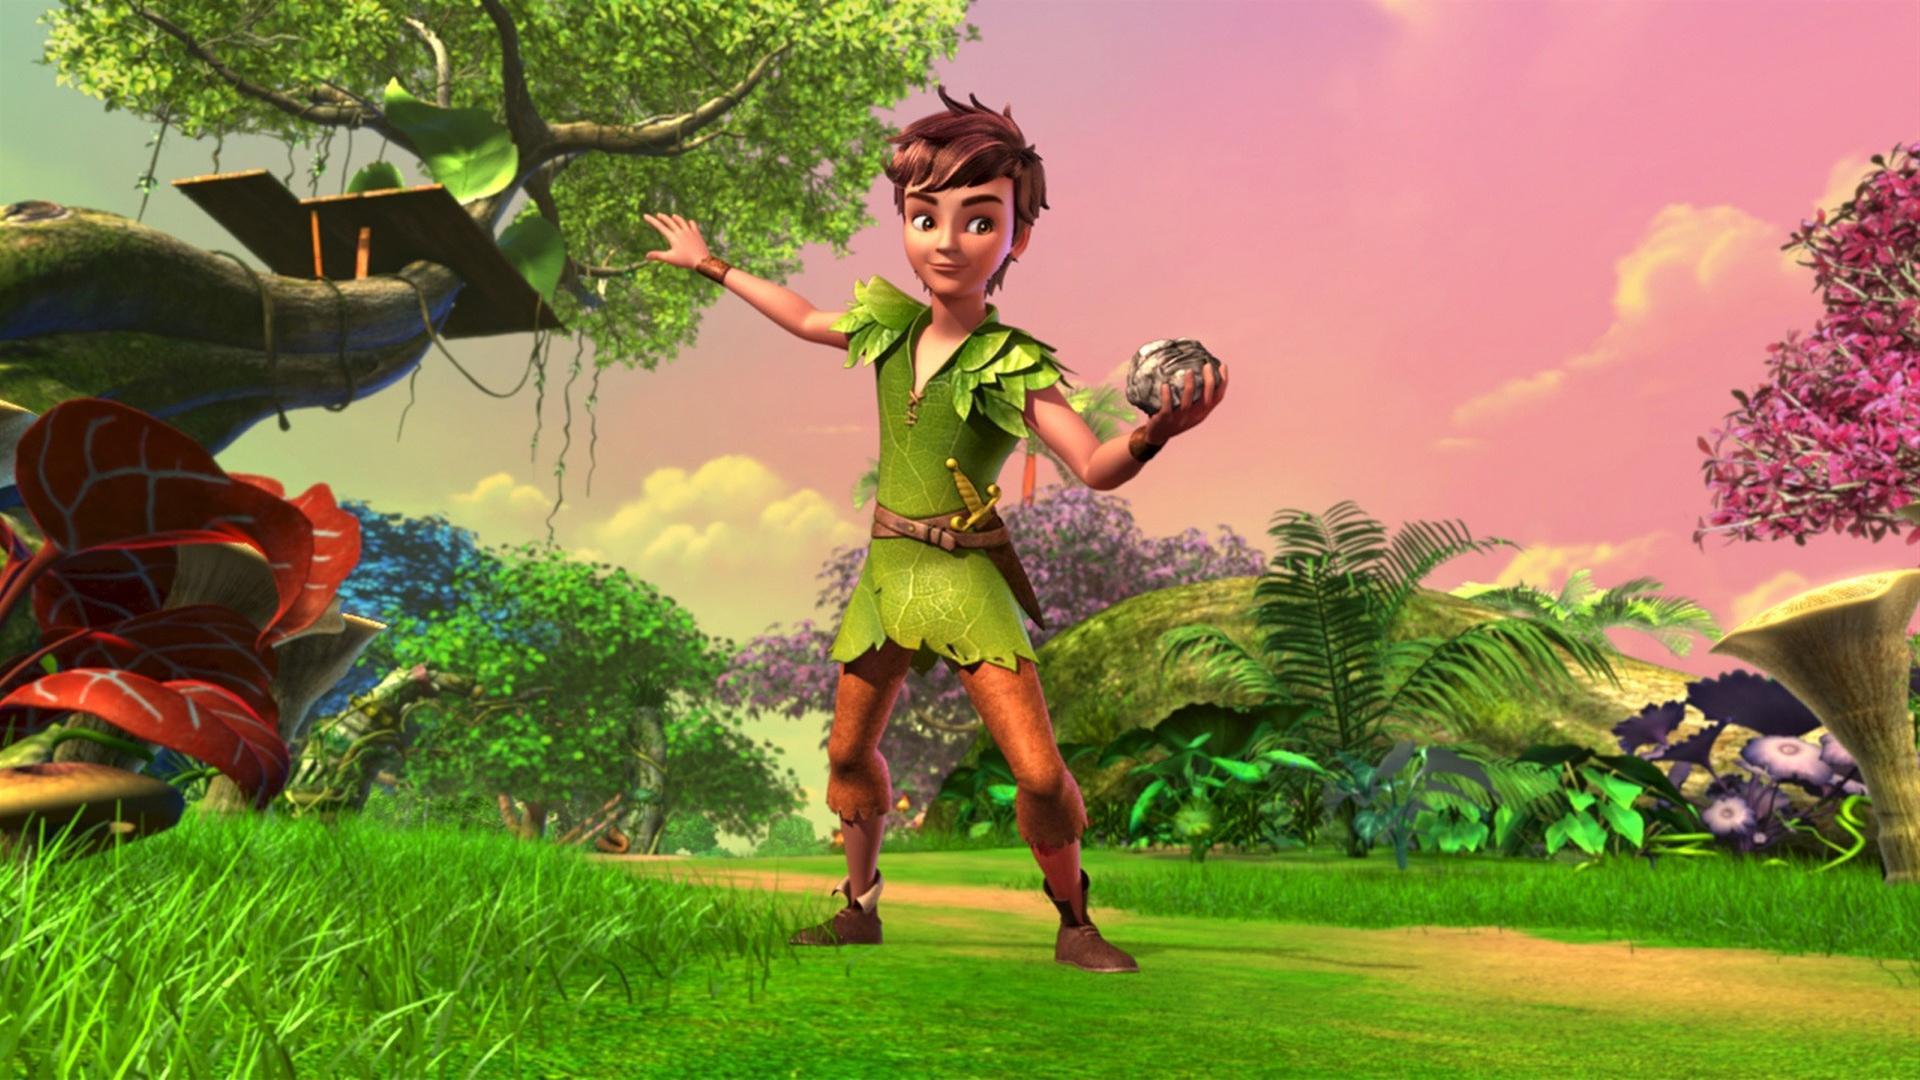 KiKA - Peter Pan